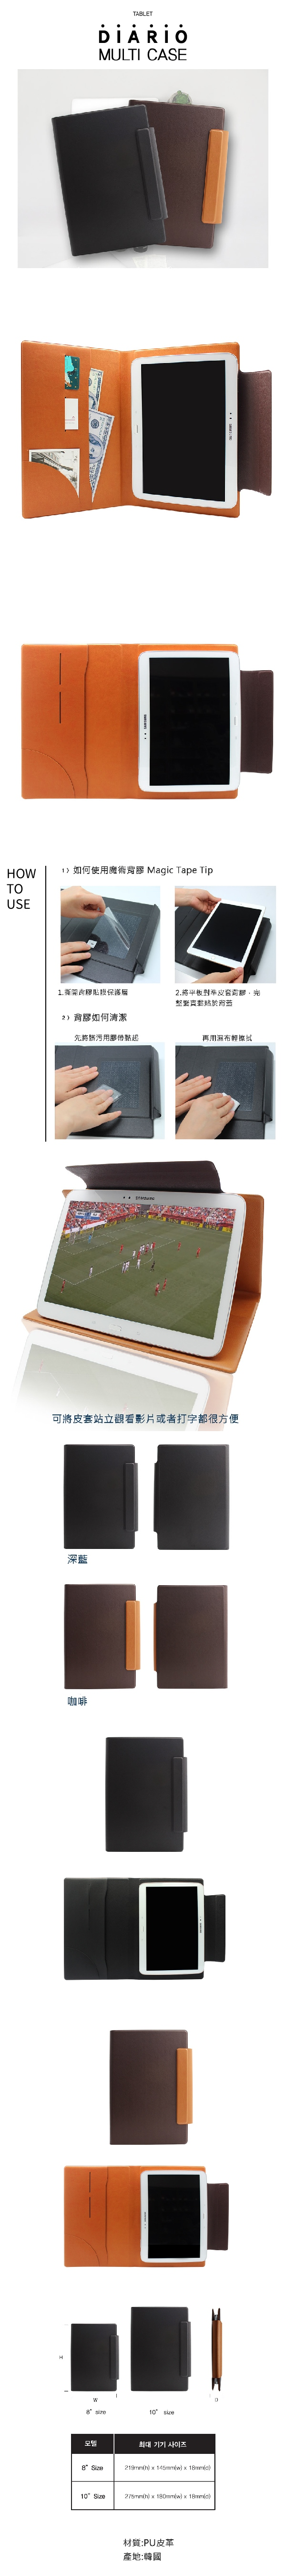 FENICE|超薄型黏貼式8吋平板電腦共用保護皮套(深藍)